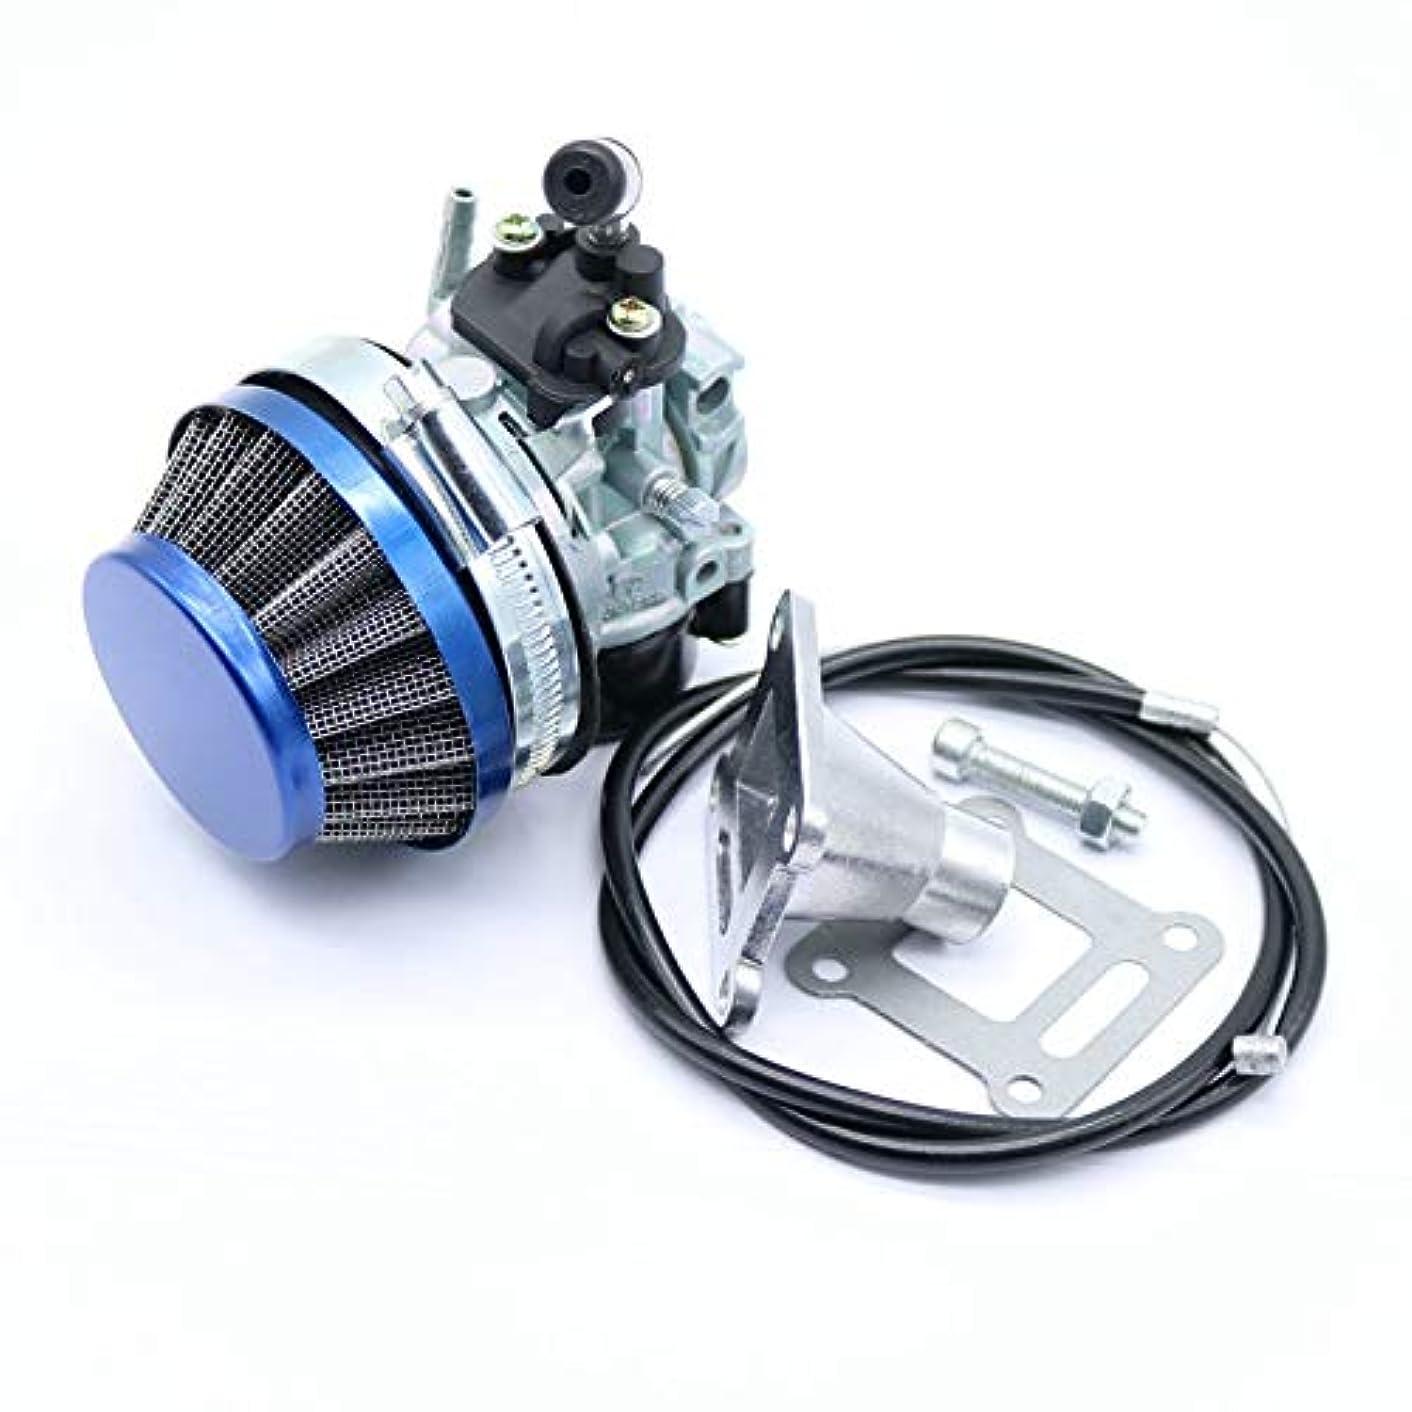 VIGAN Racing Carb Carburetor Air Filter for 49cc 50cc 80cc 2 Stroke Gas Motorized Bike